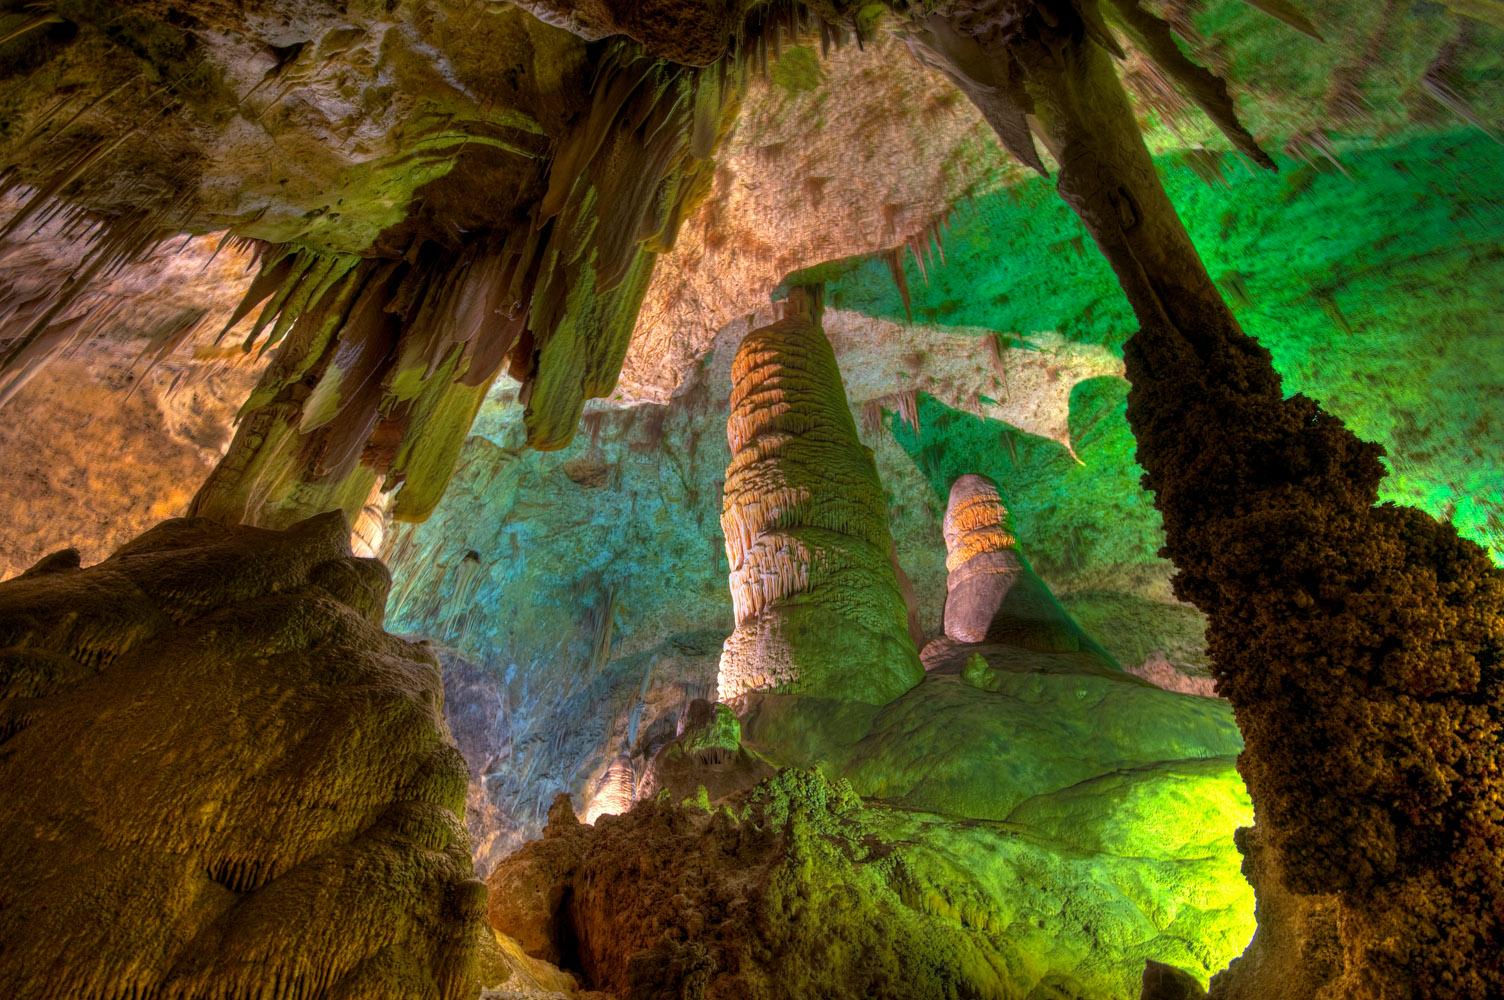 Carlsbad Cavern, New Mexico, United States